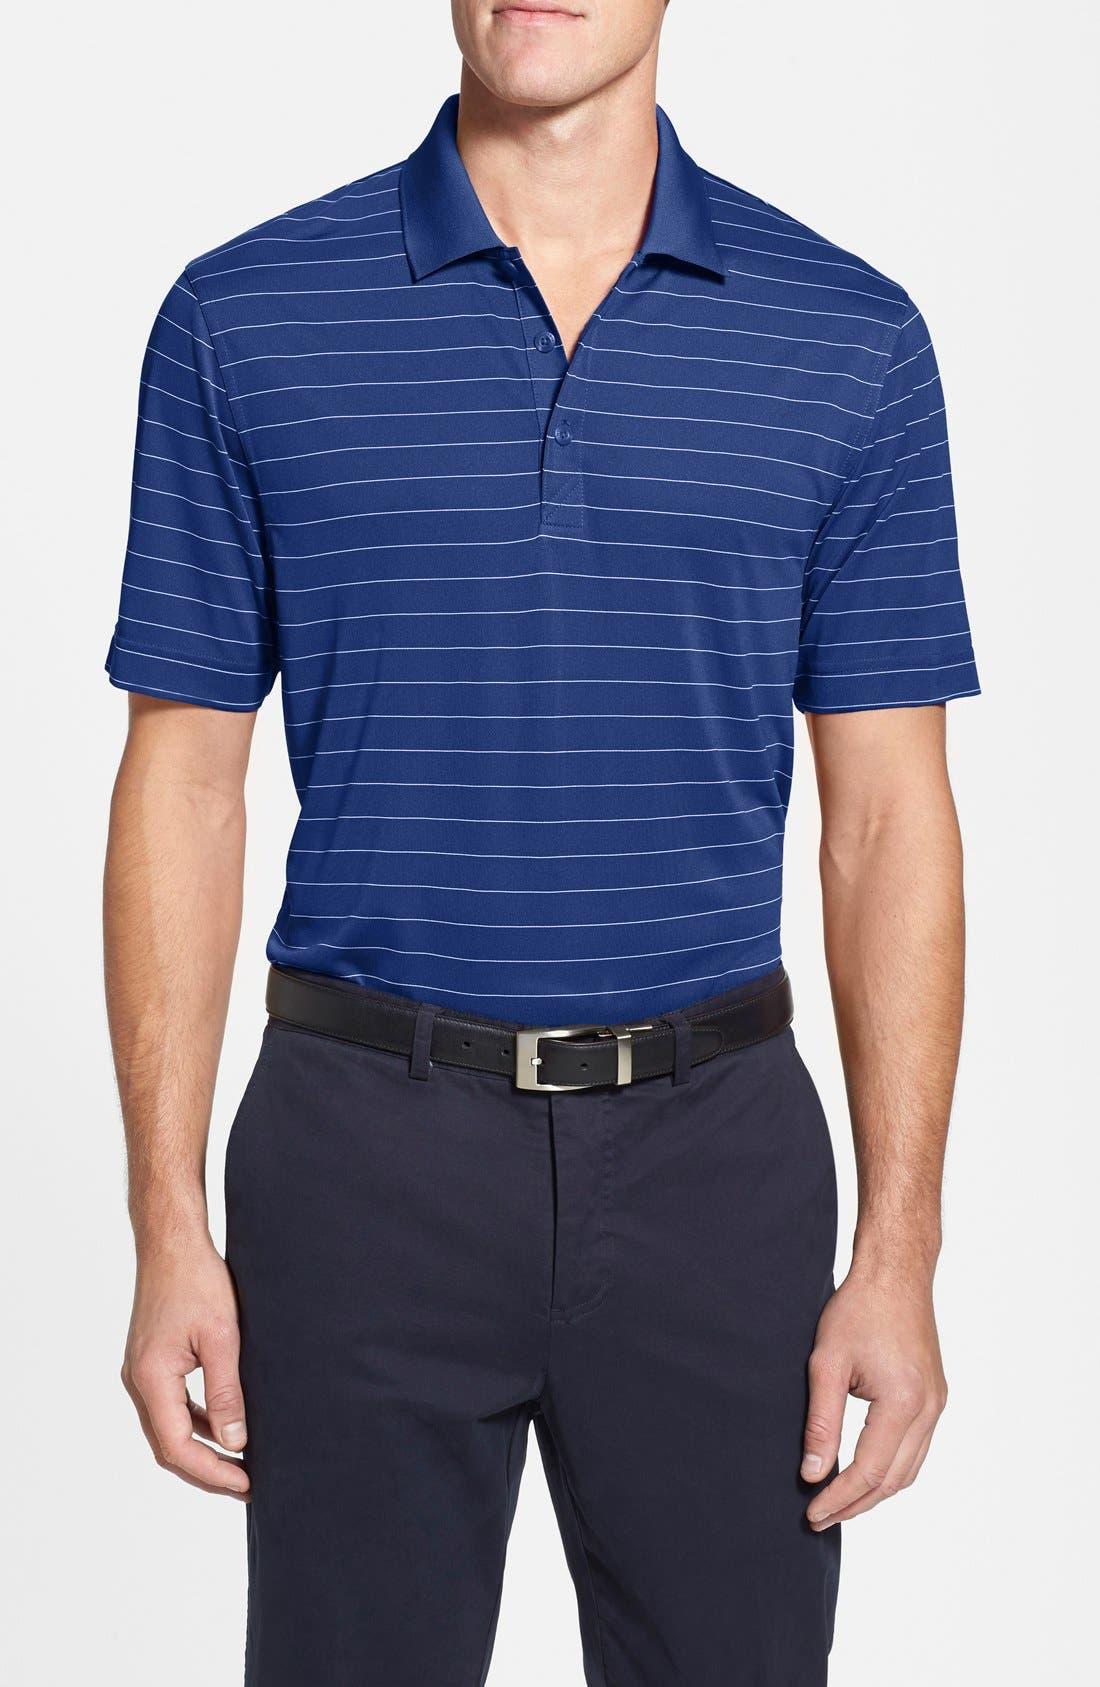 Franklin Stripe DryTec<sup>®</sup> Polo,                         Main,                         color, Tour Blue/ White